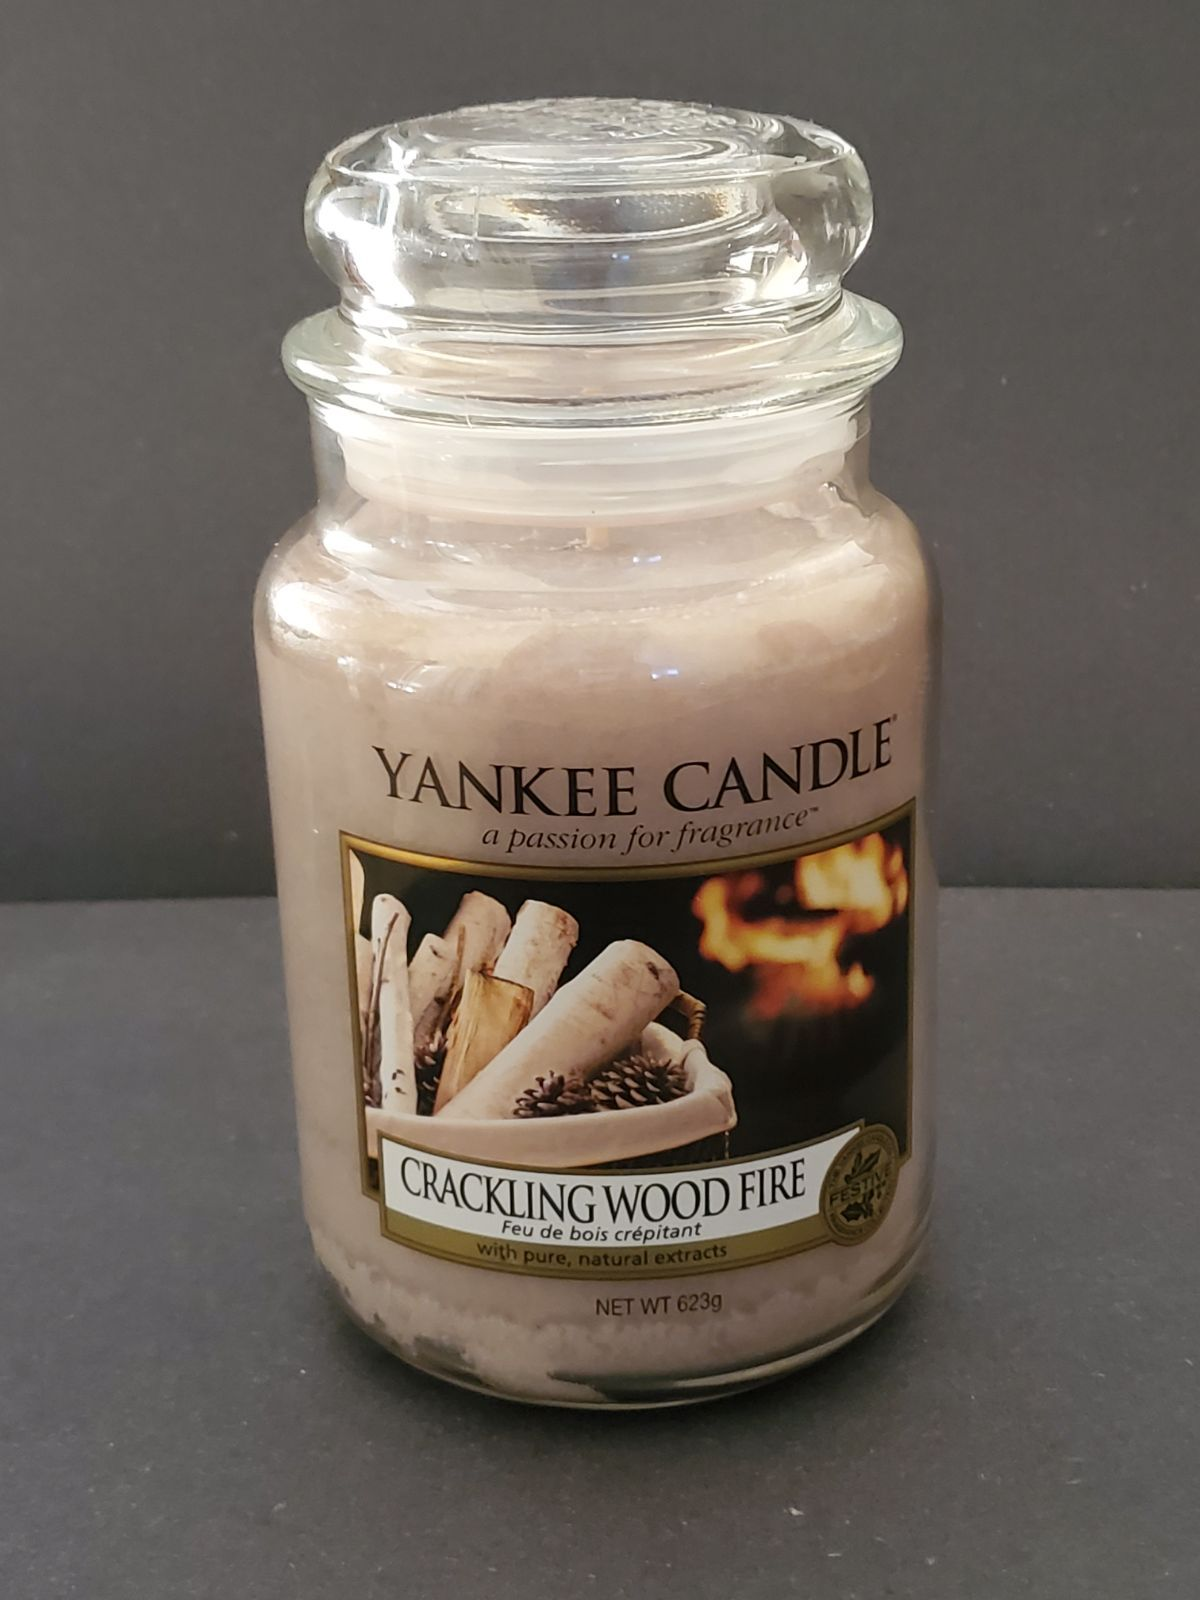 Yankee Candle Wax Melt Crackling Wood Fire